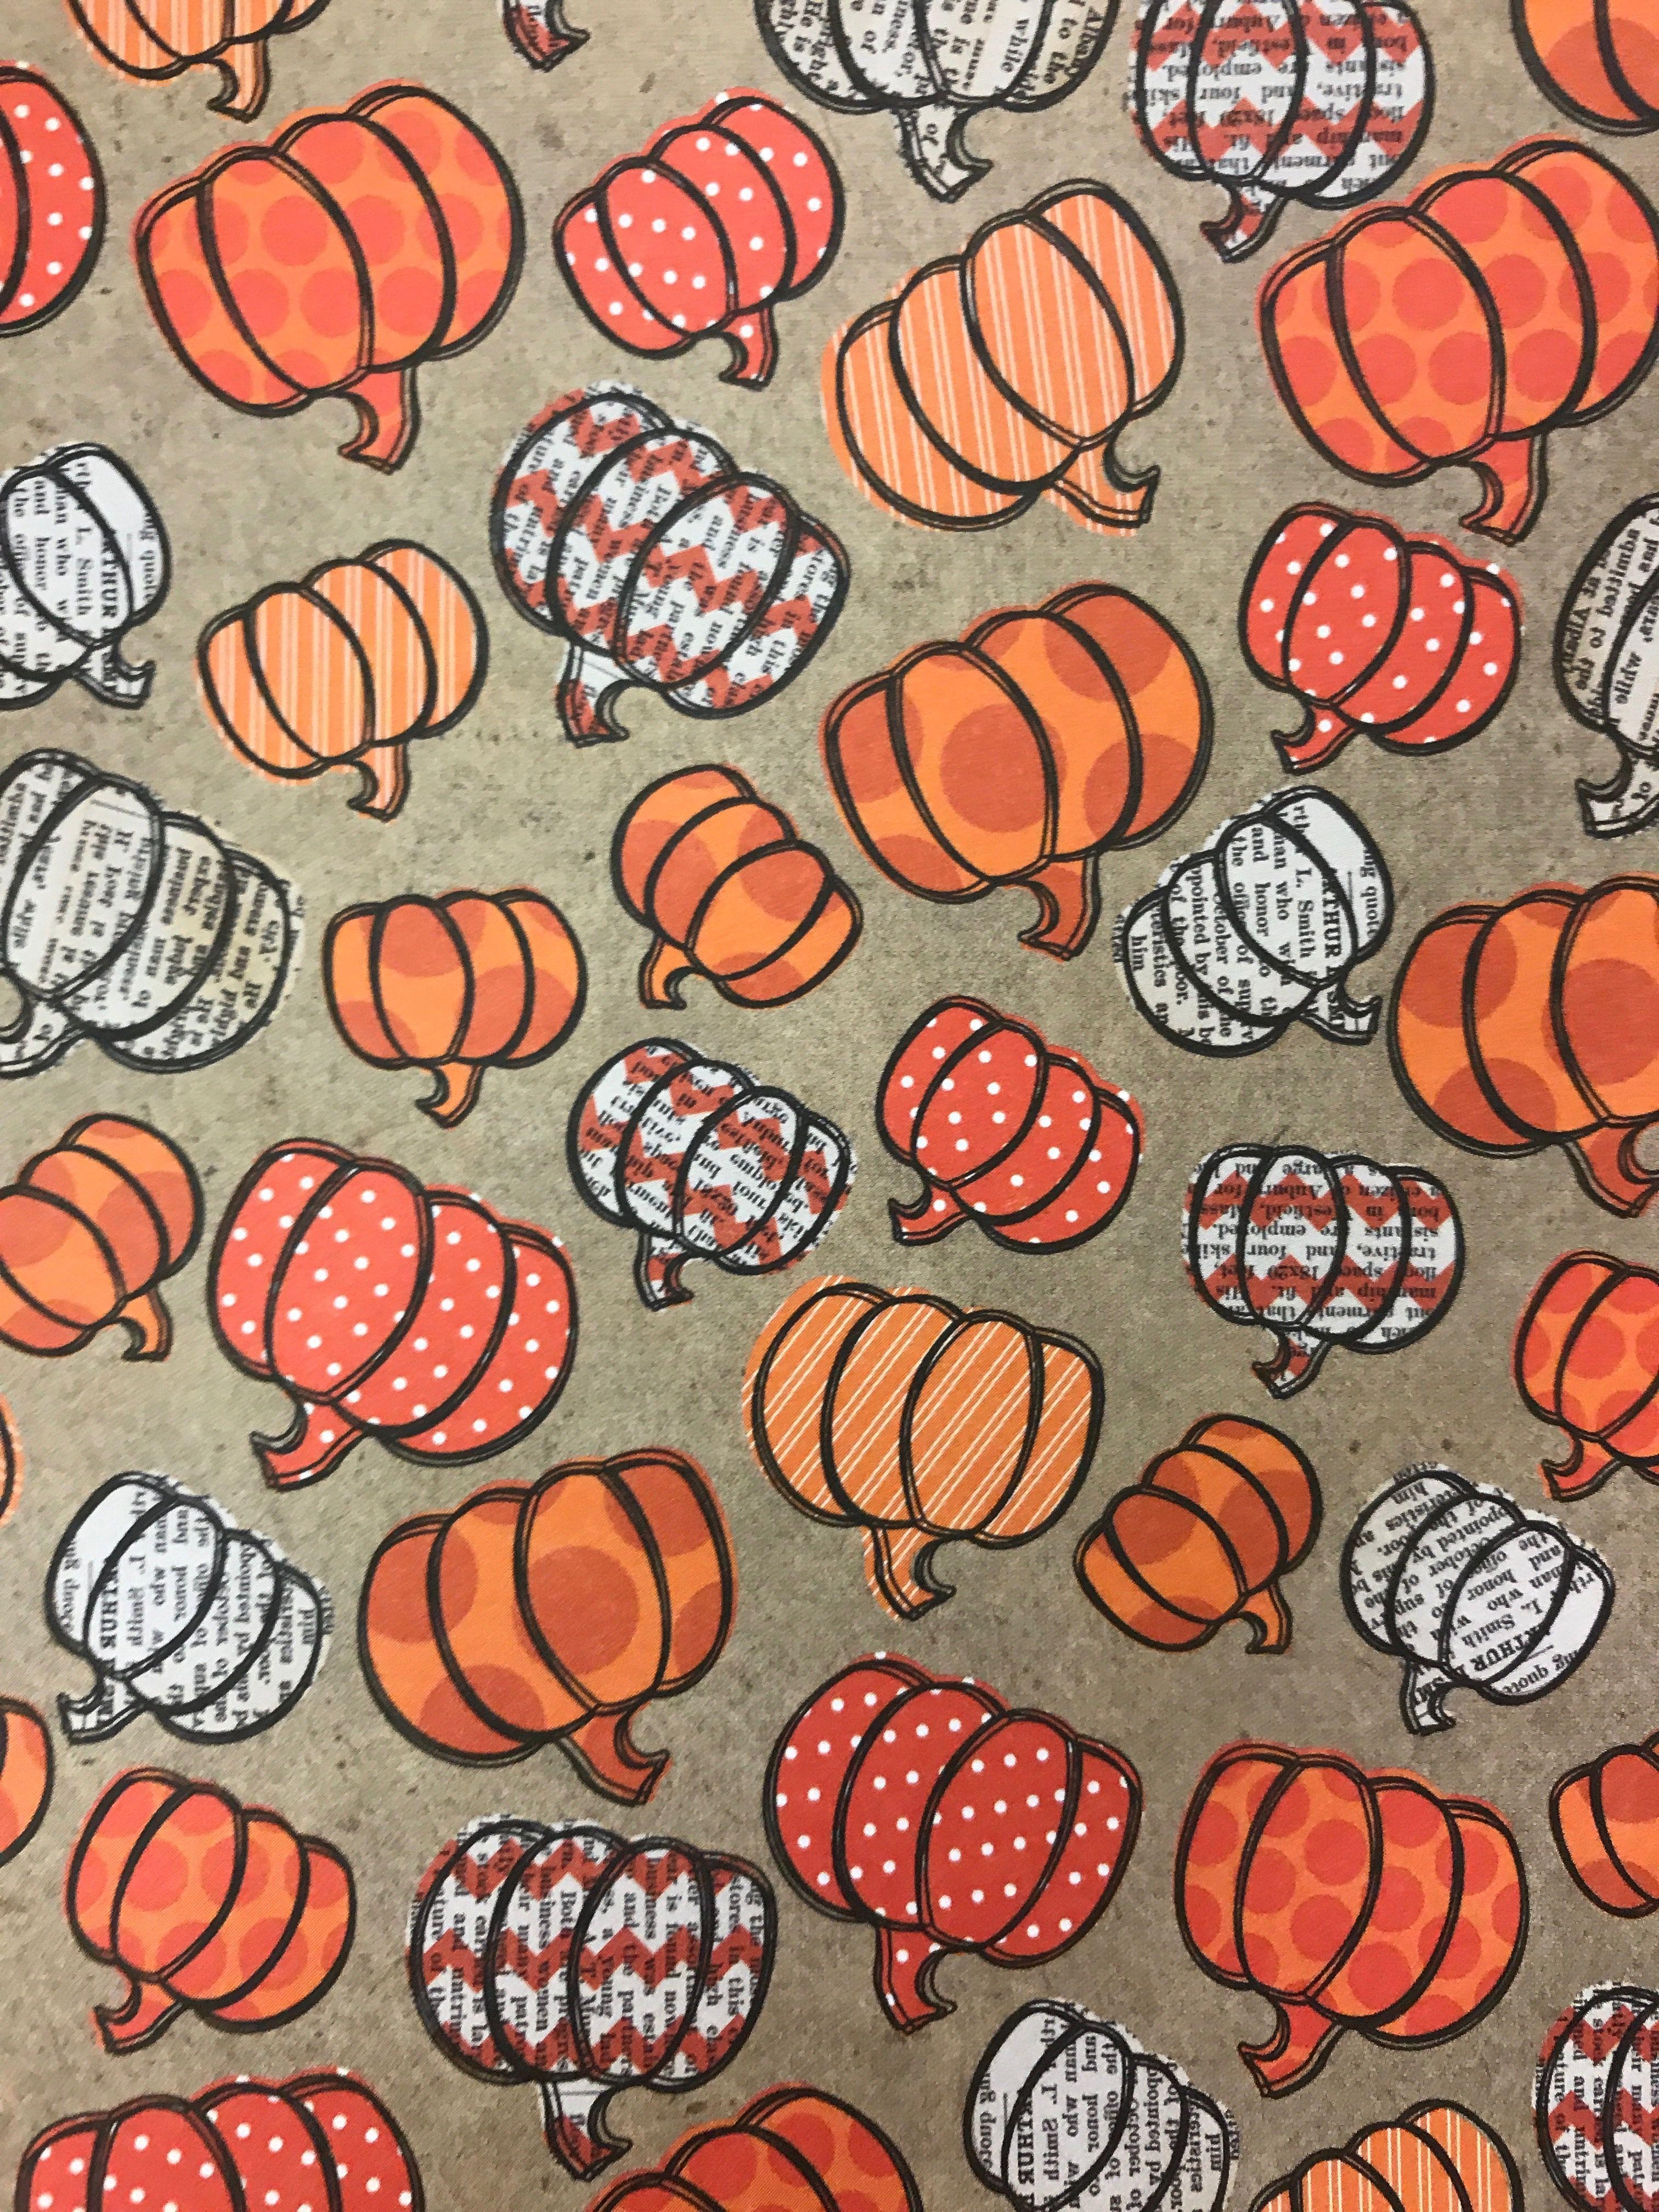 Pin by Lauren Markert on Thanksgiving Pinterest